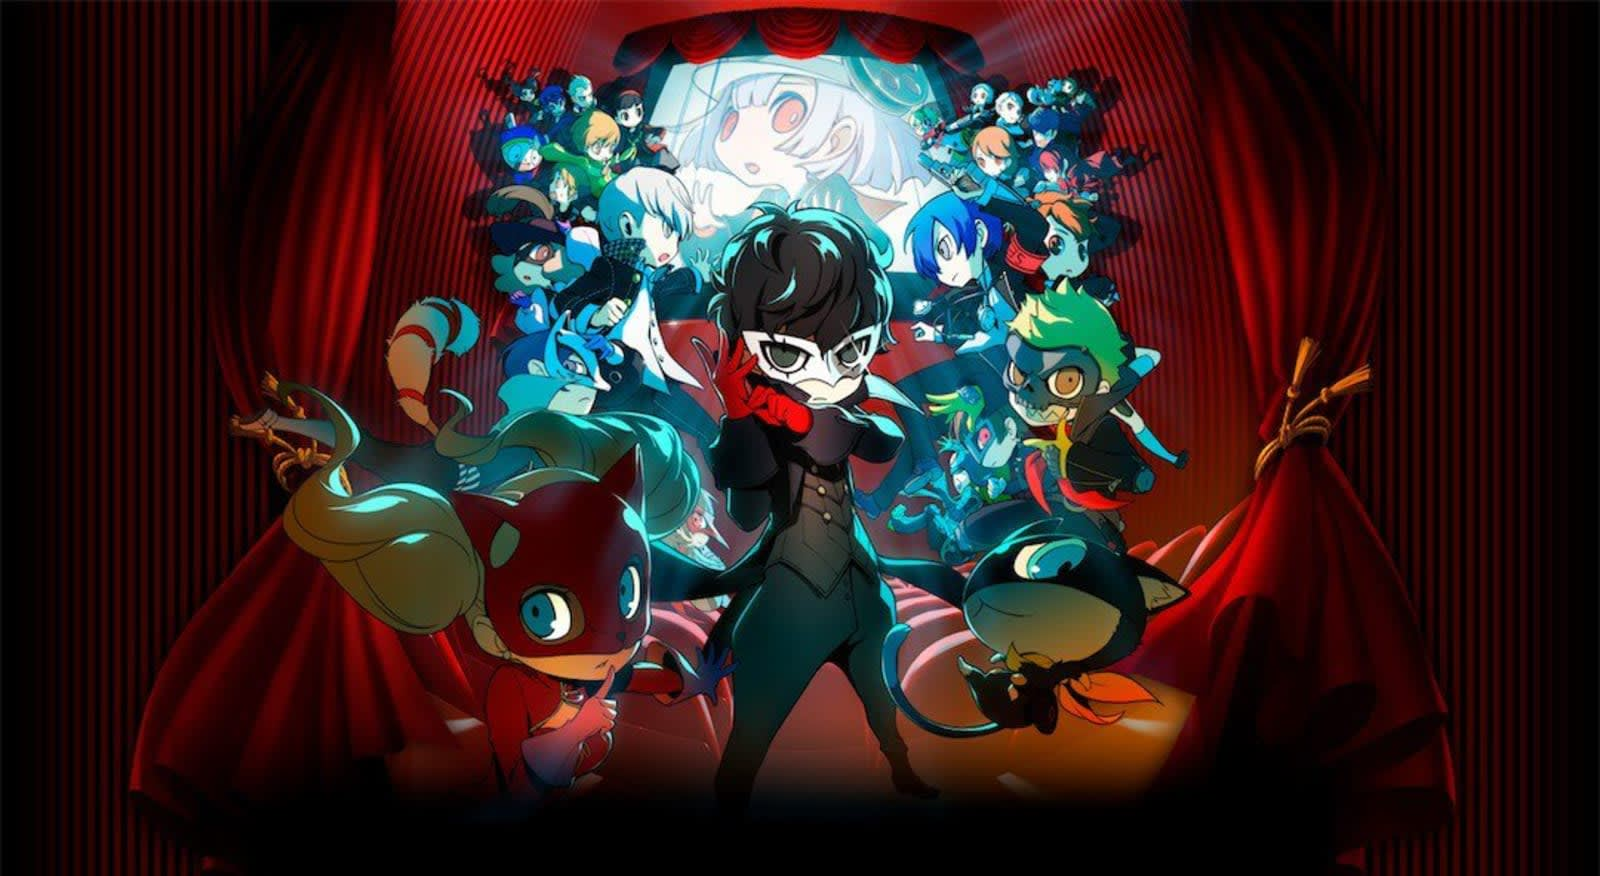 Persona Q2: New Cinema Labyrinth' coming to North America